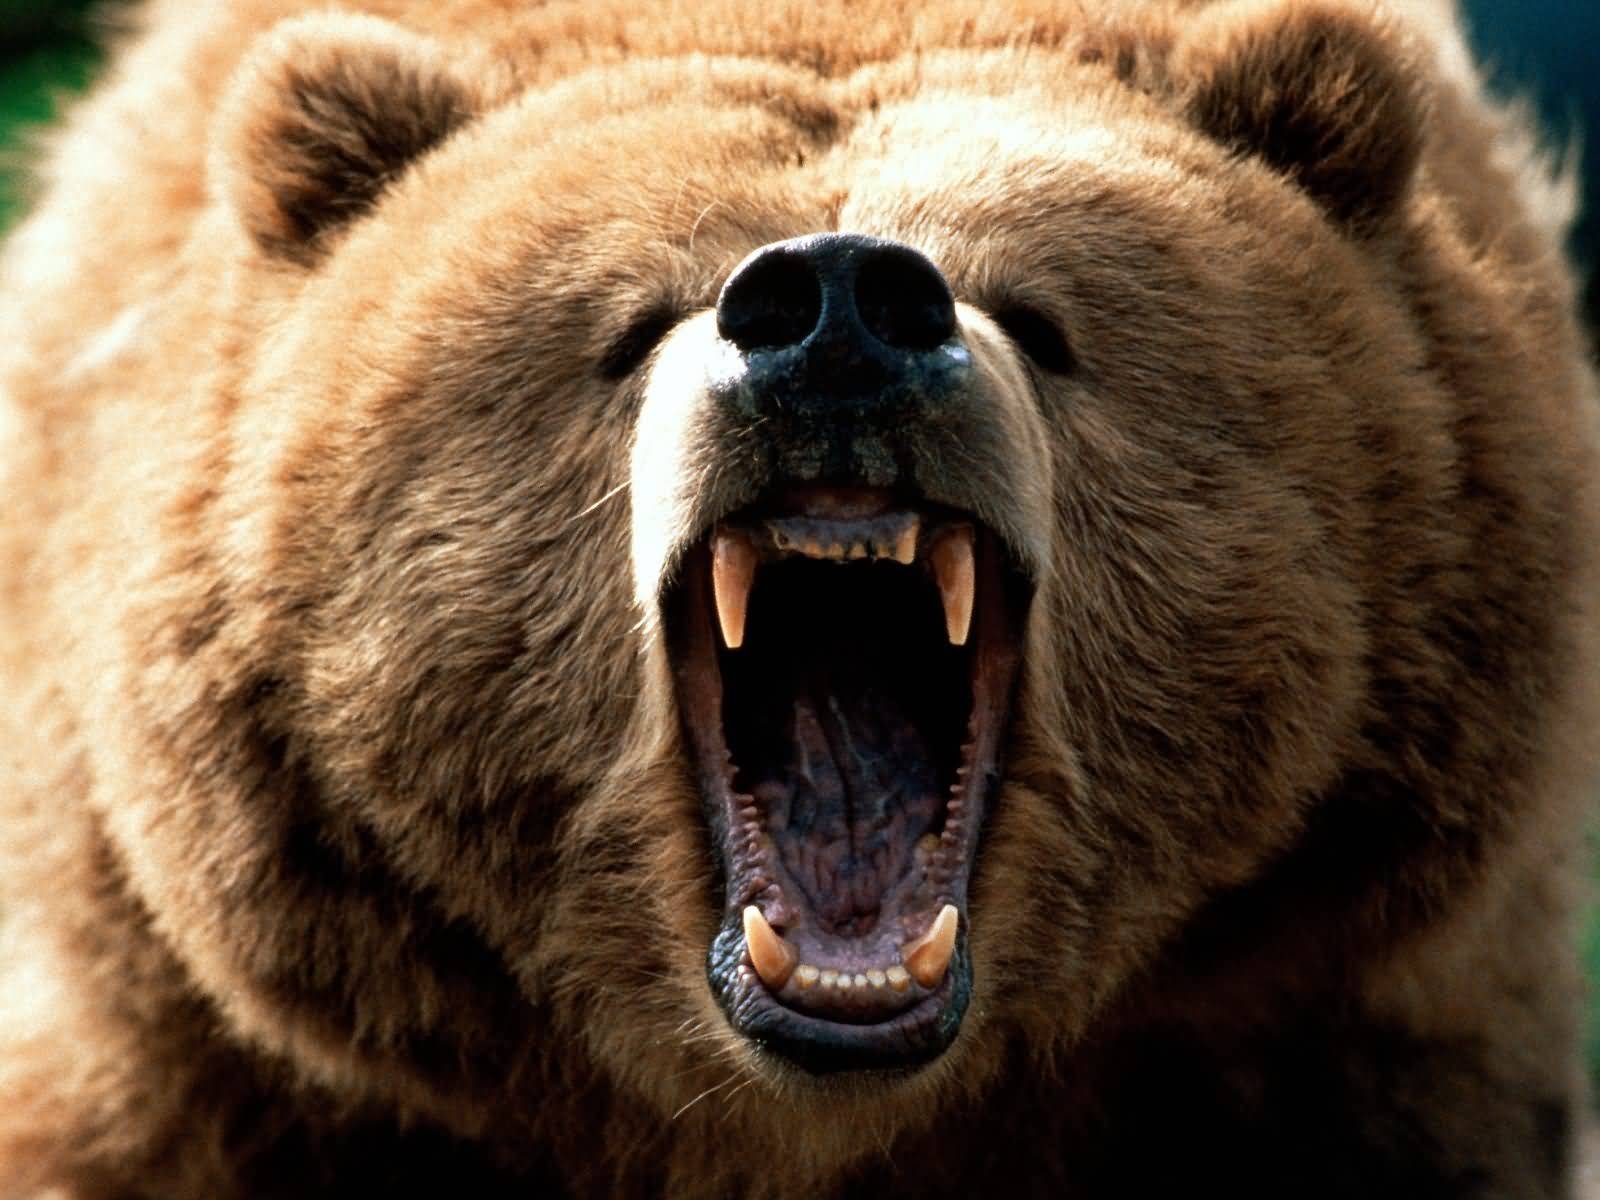 http://4.bp.blogspot.com/_nn4b2gkHsEU/TMMKlshTnLI/AAAAAAAAH9A/aiLGPVFg-LA/s1600/grizzly.jpg